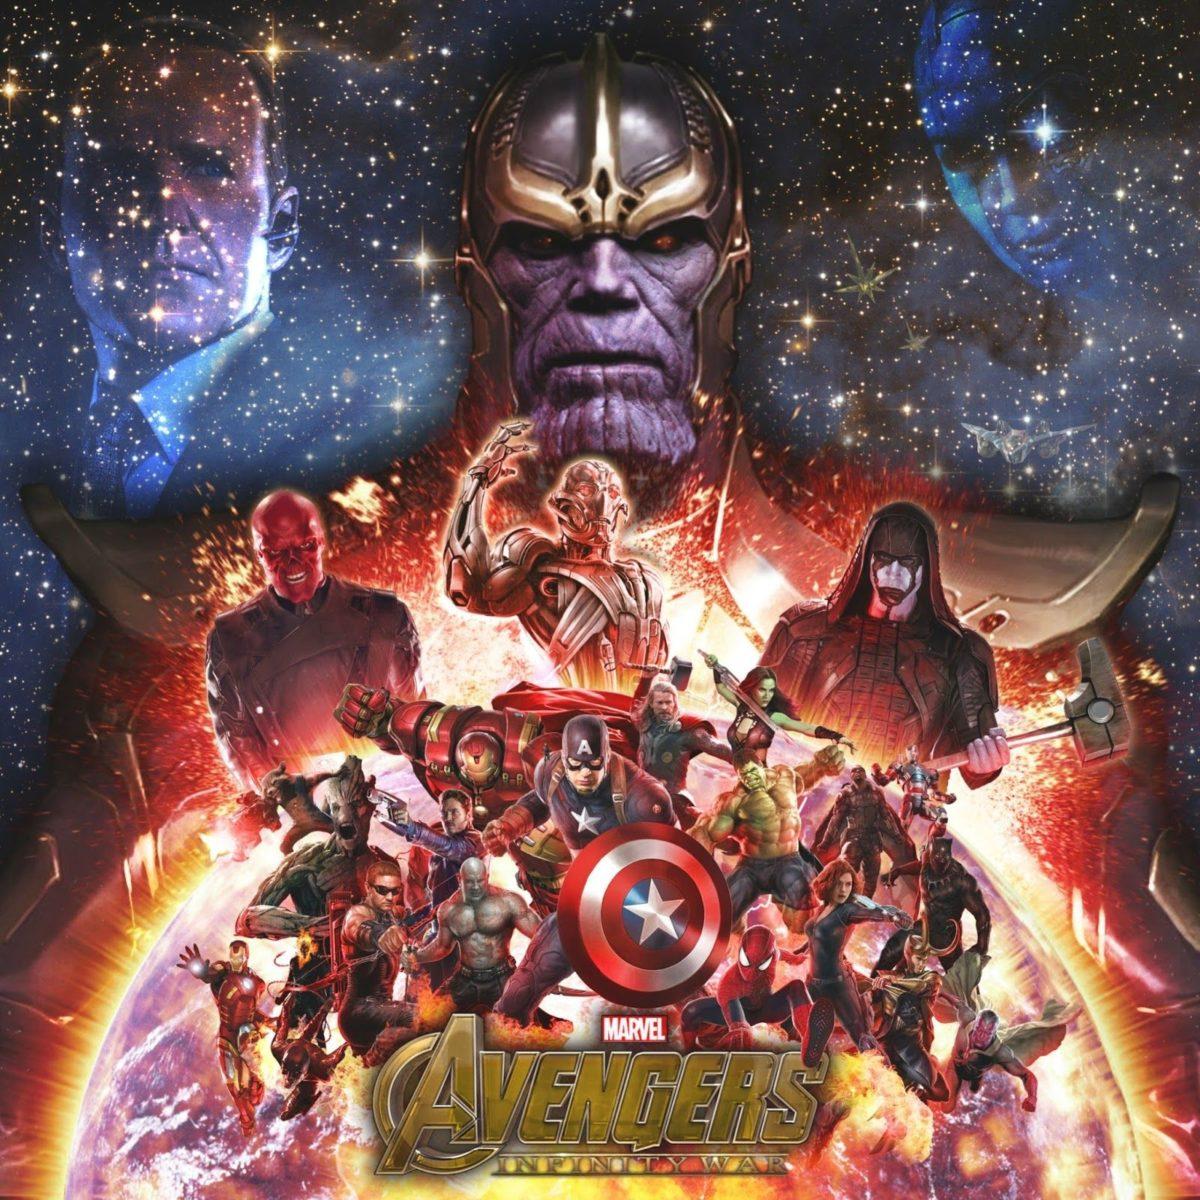 HD Wallpapers : Avengers İnfinity War HD Wallpapers